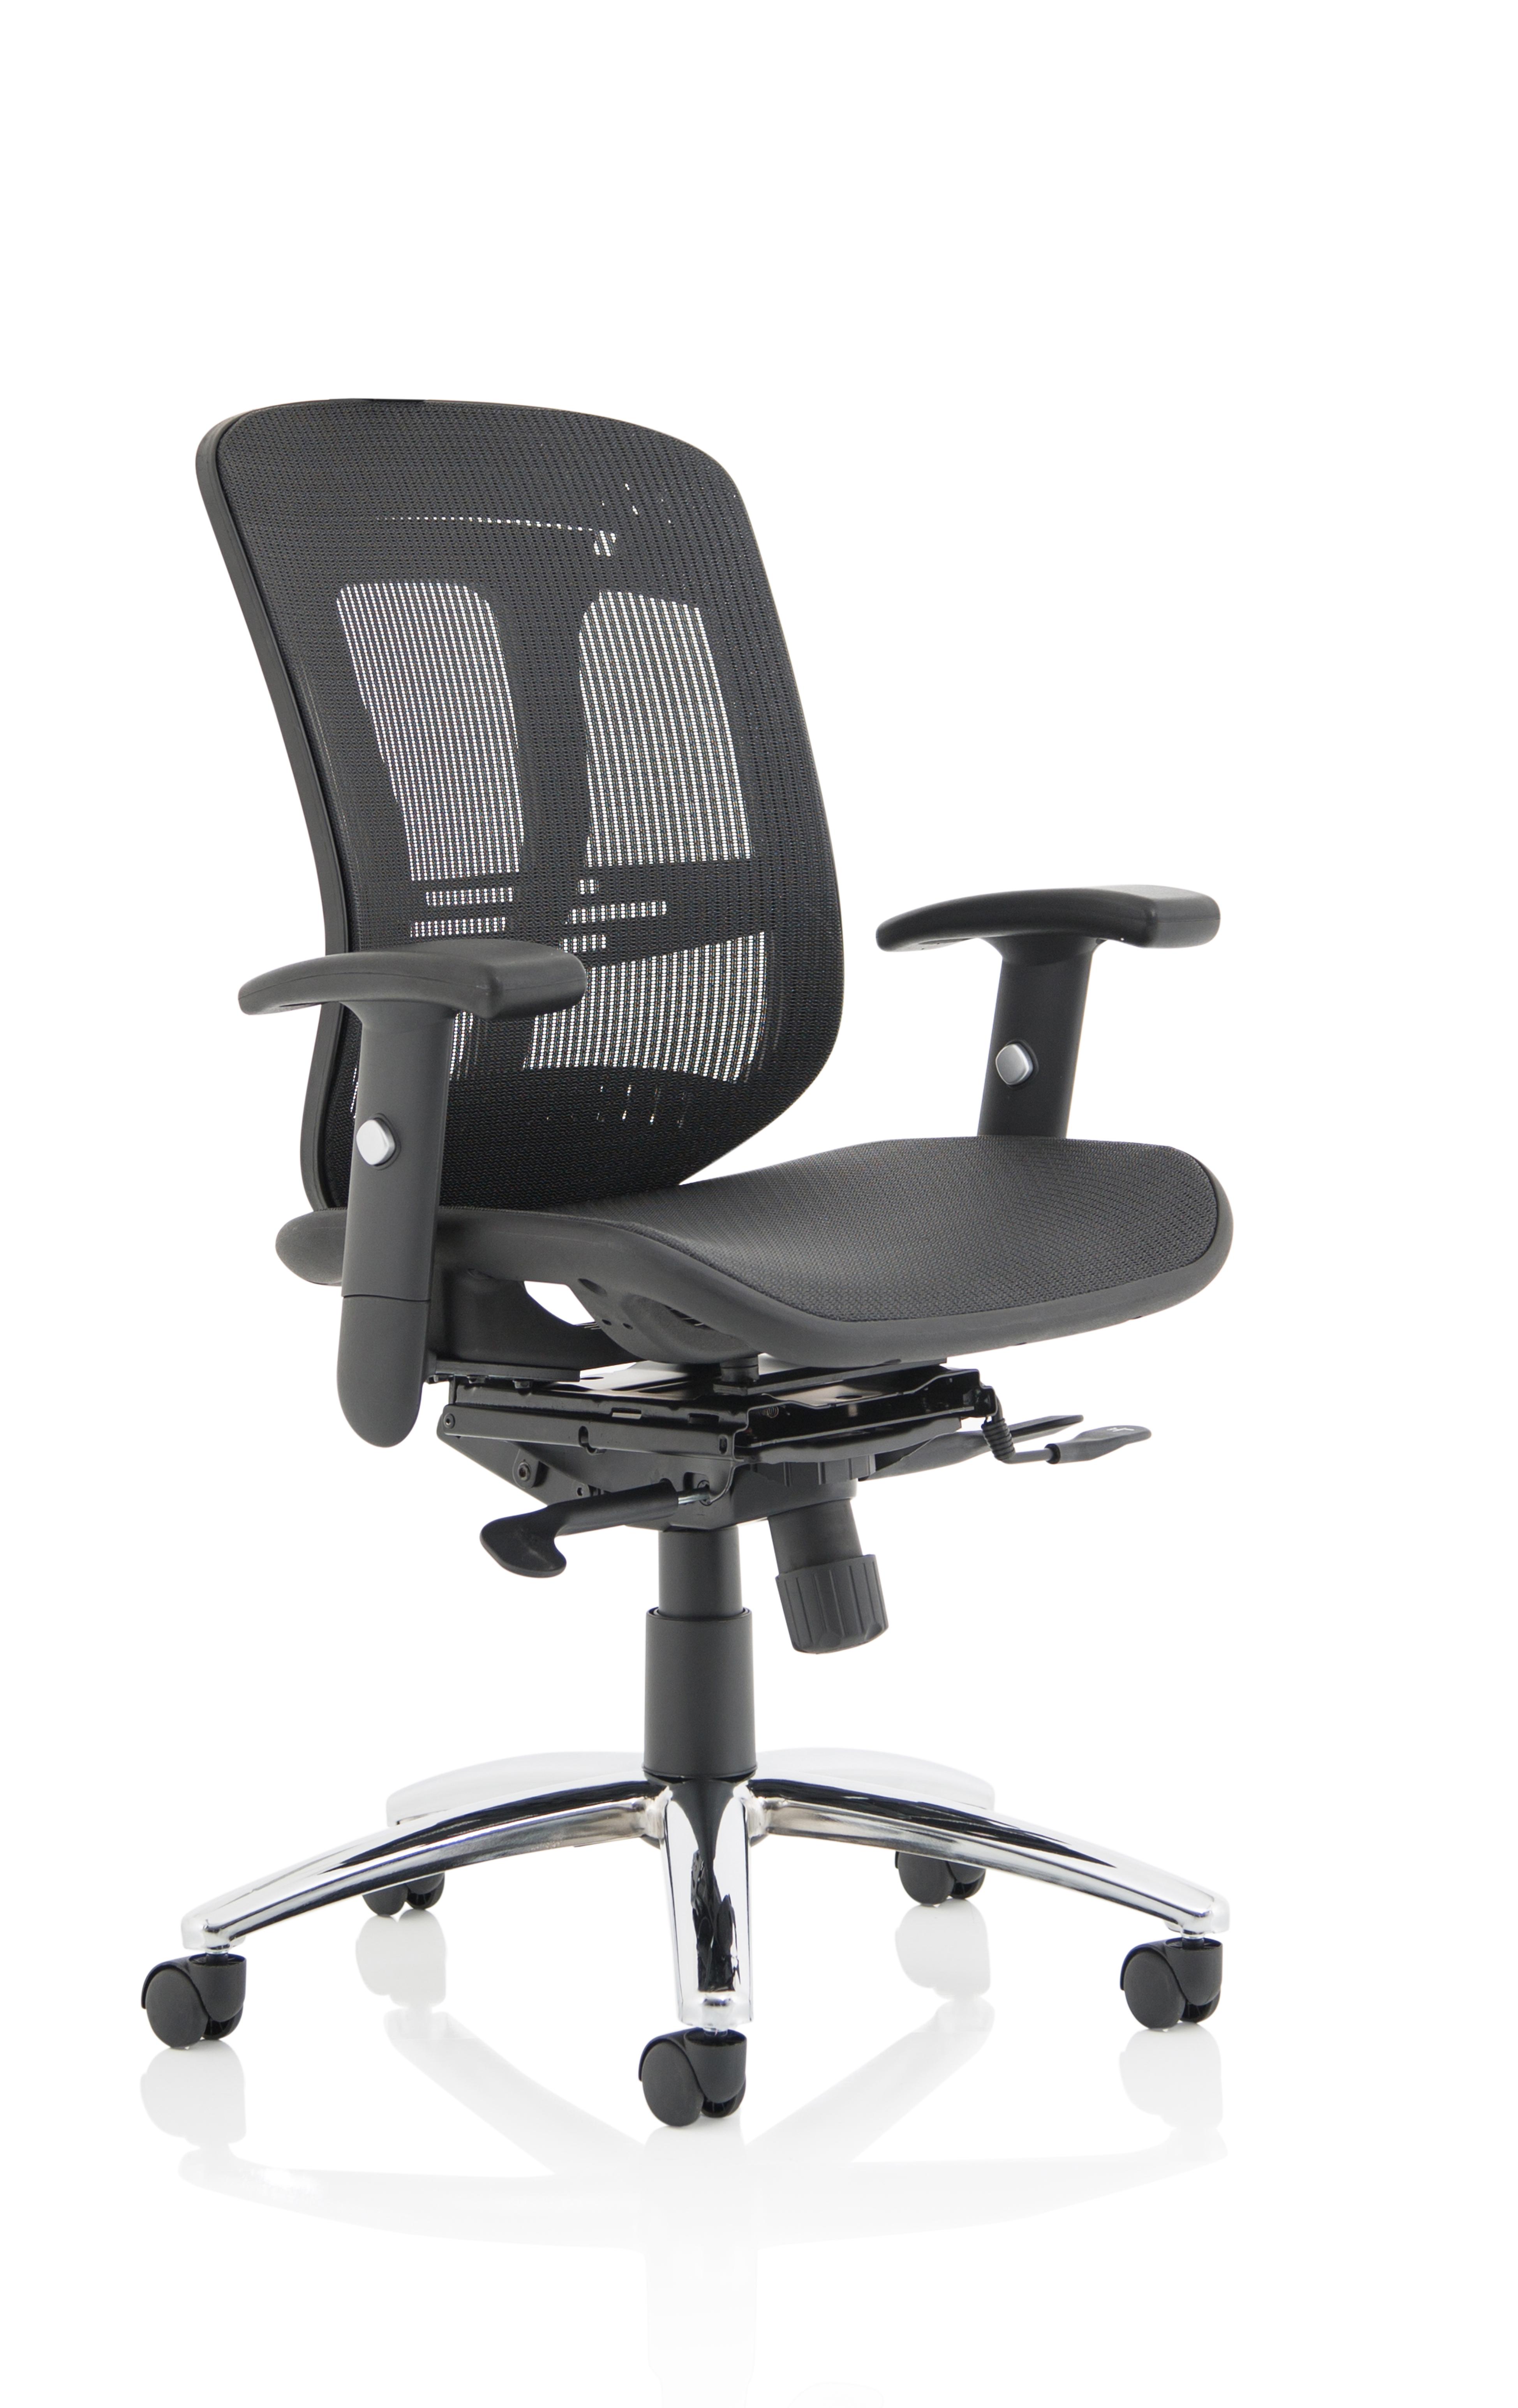 Executive Chairs Mirage II Executive Chair Black Mesh EX000162